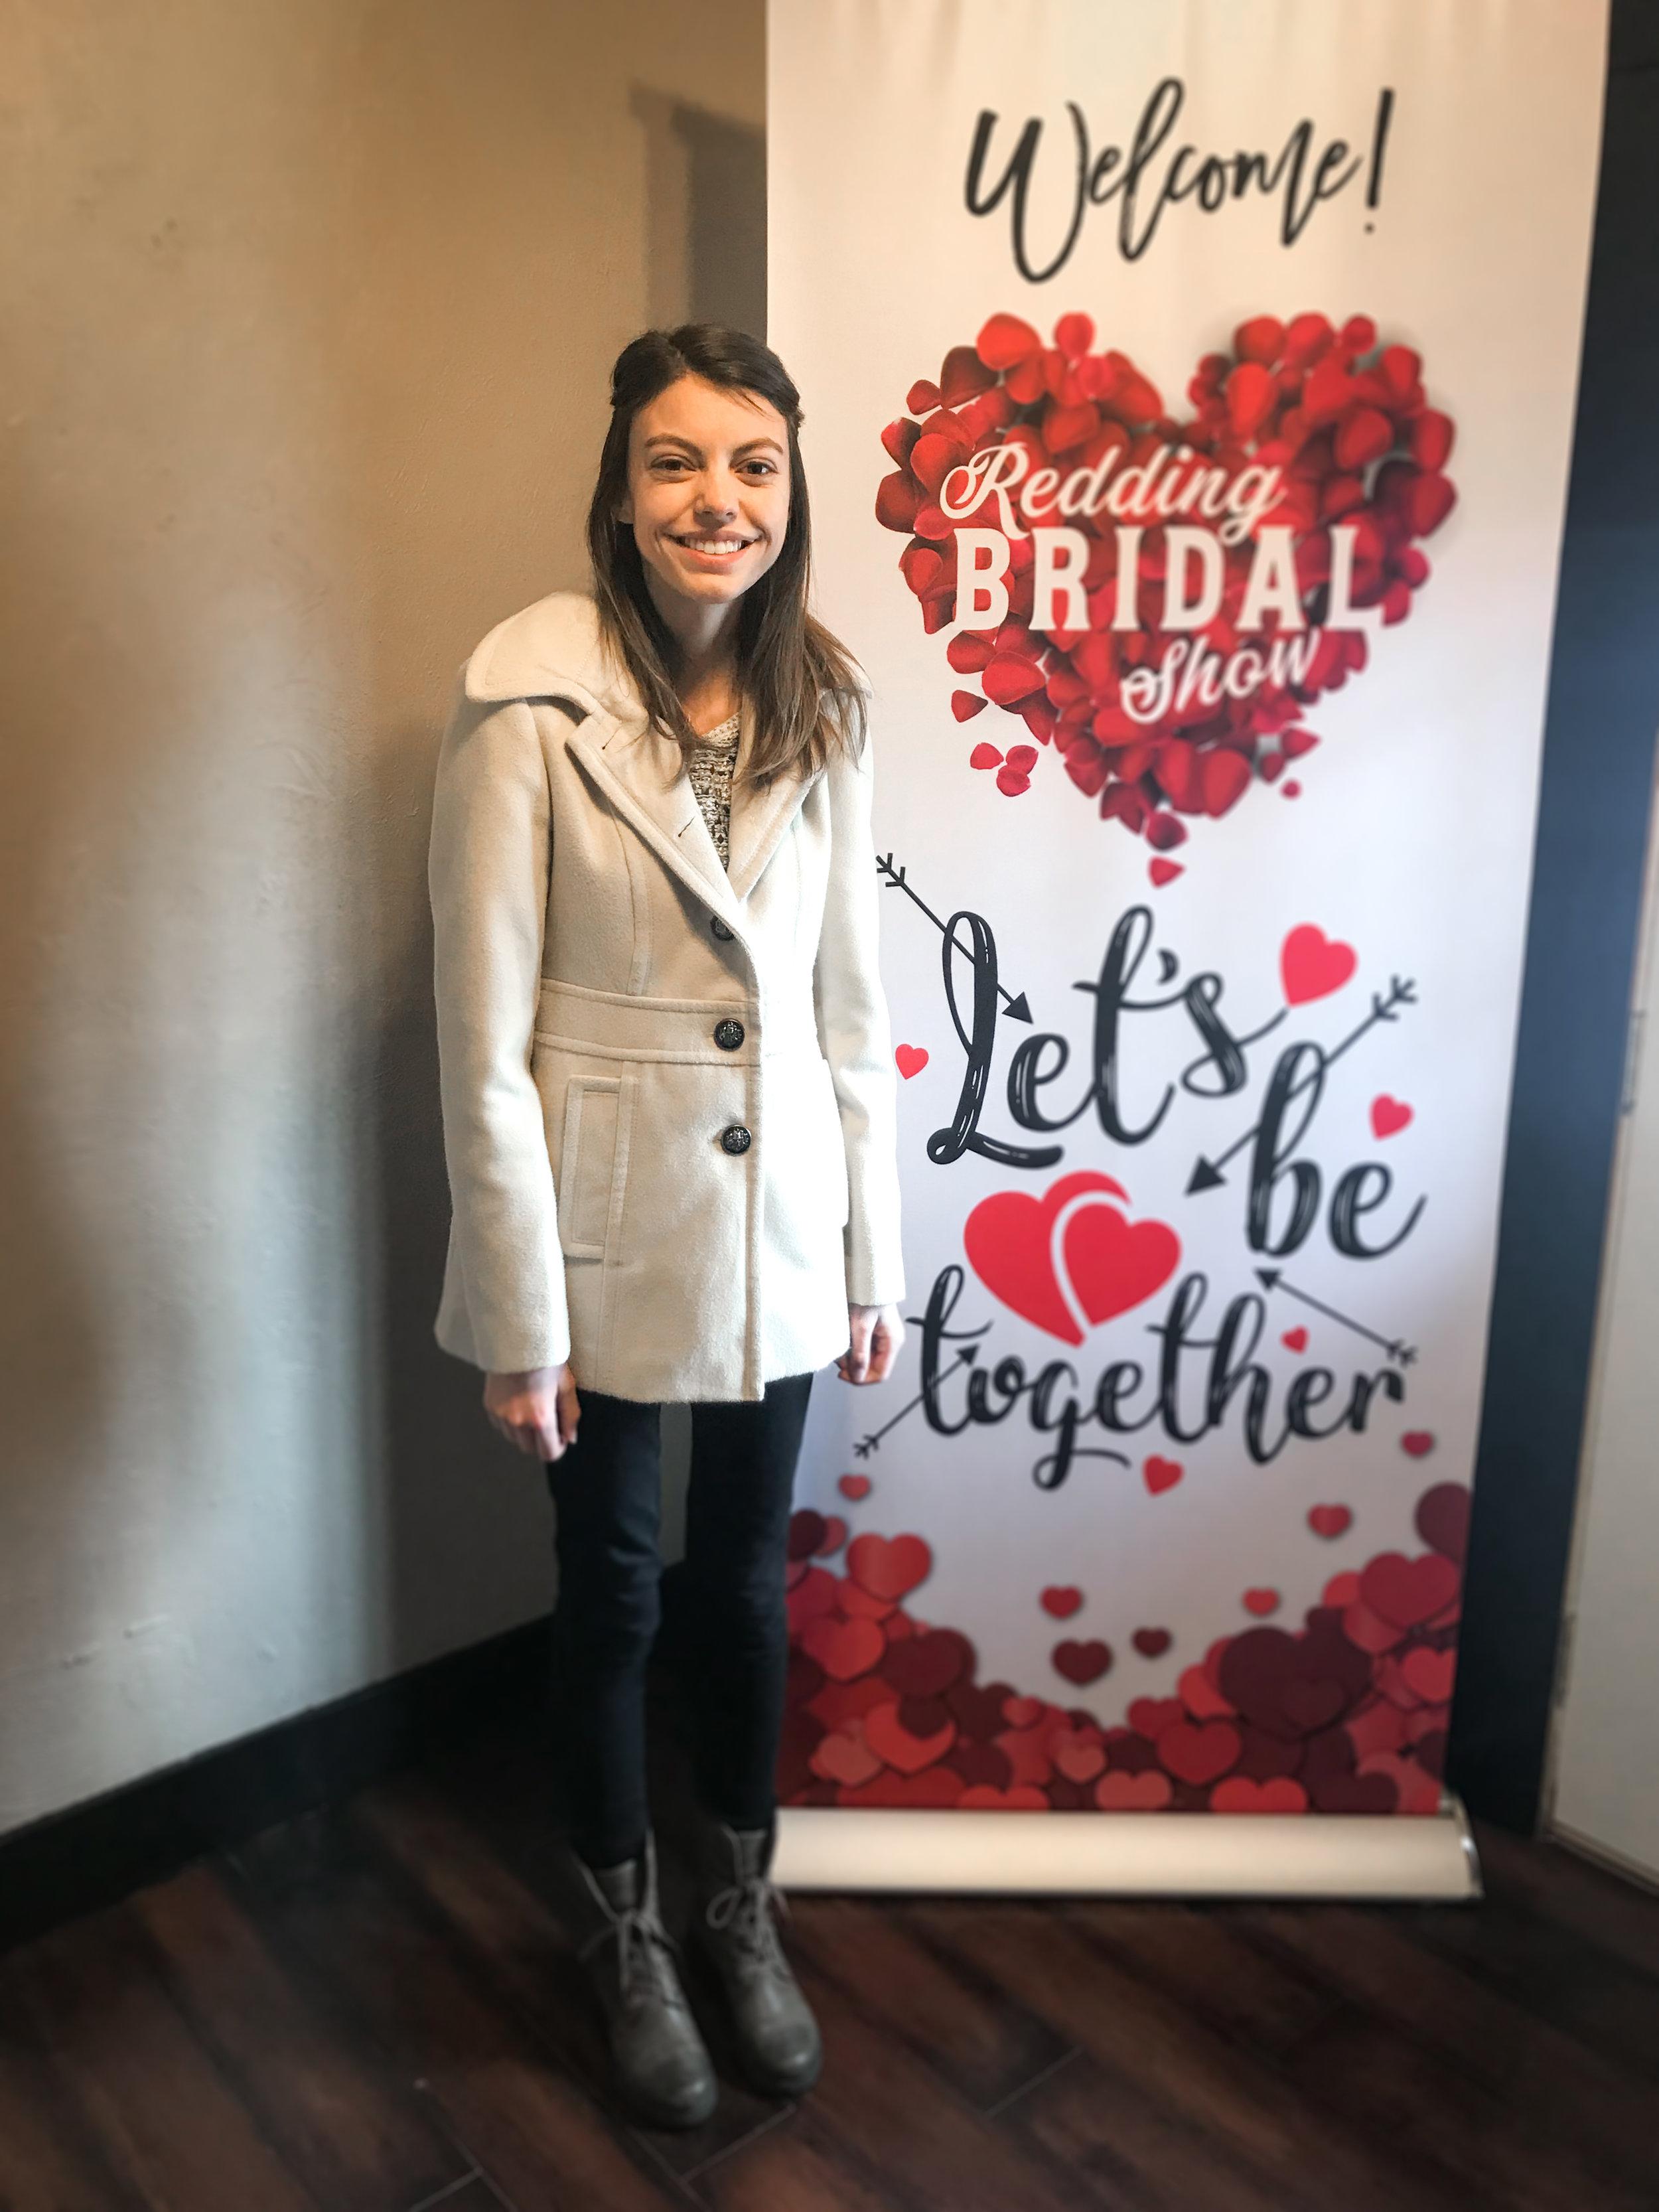 Sheraton Hotel Redding Prize Winner Redding Bridal Show